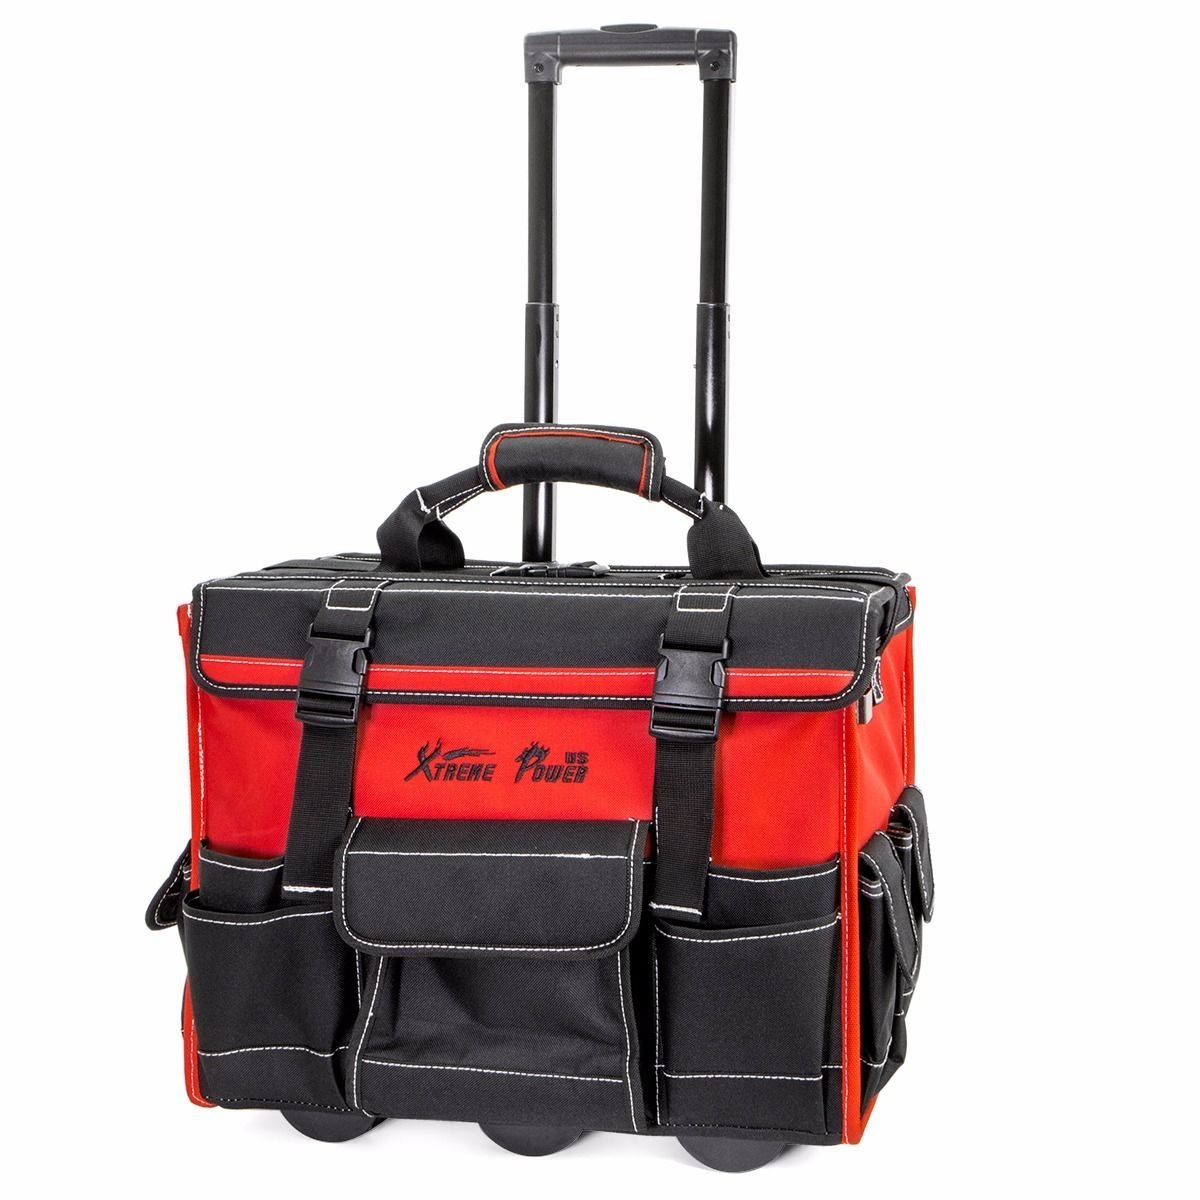 18'' Rolling portable Heavy Duty Portable Tool Bag Storage Organizer Tote pouch by khonanpai